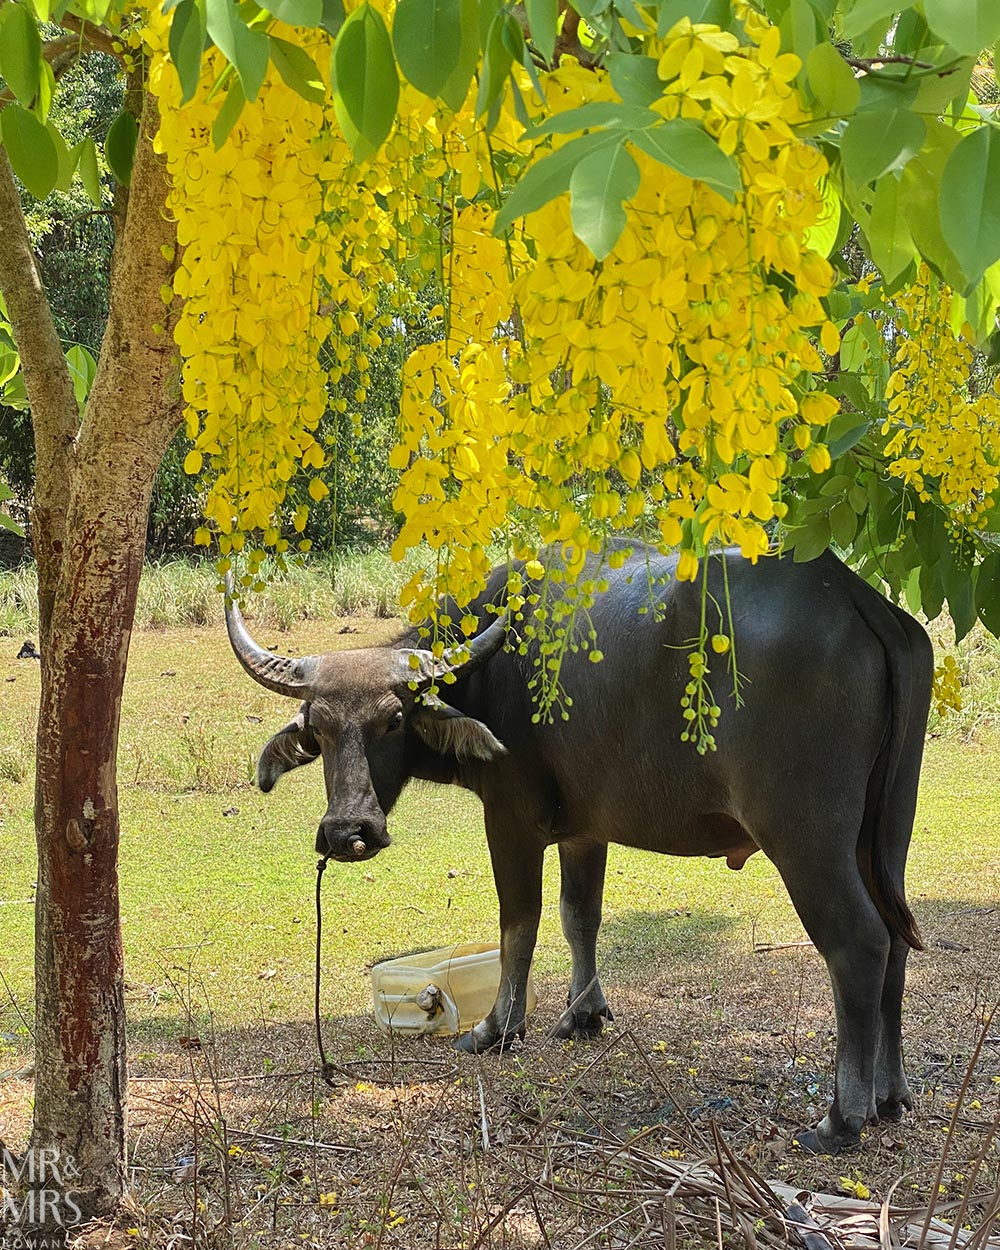 Water buffalo Ko Klang, Thailand coronavirus COVID-19